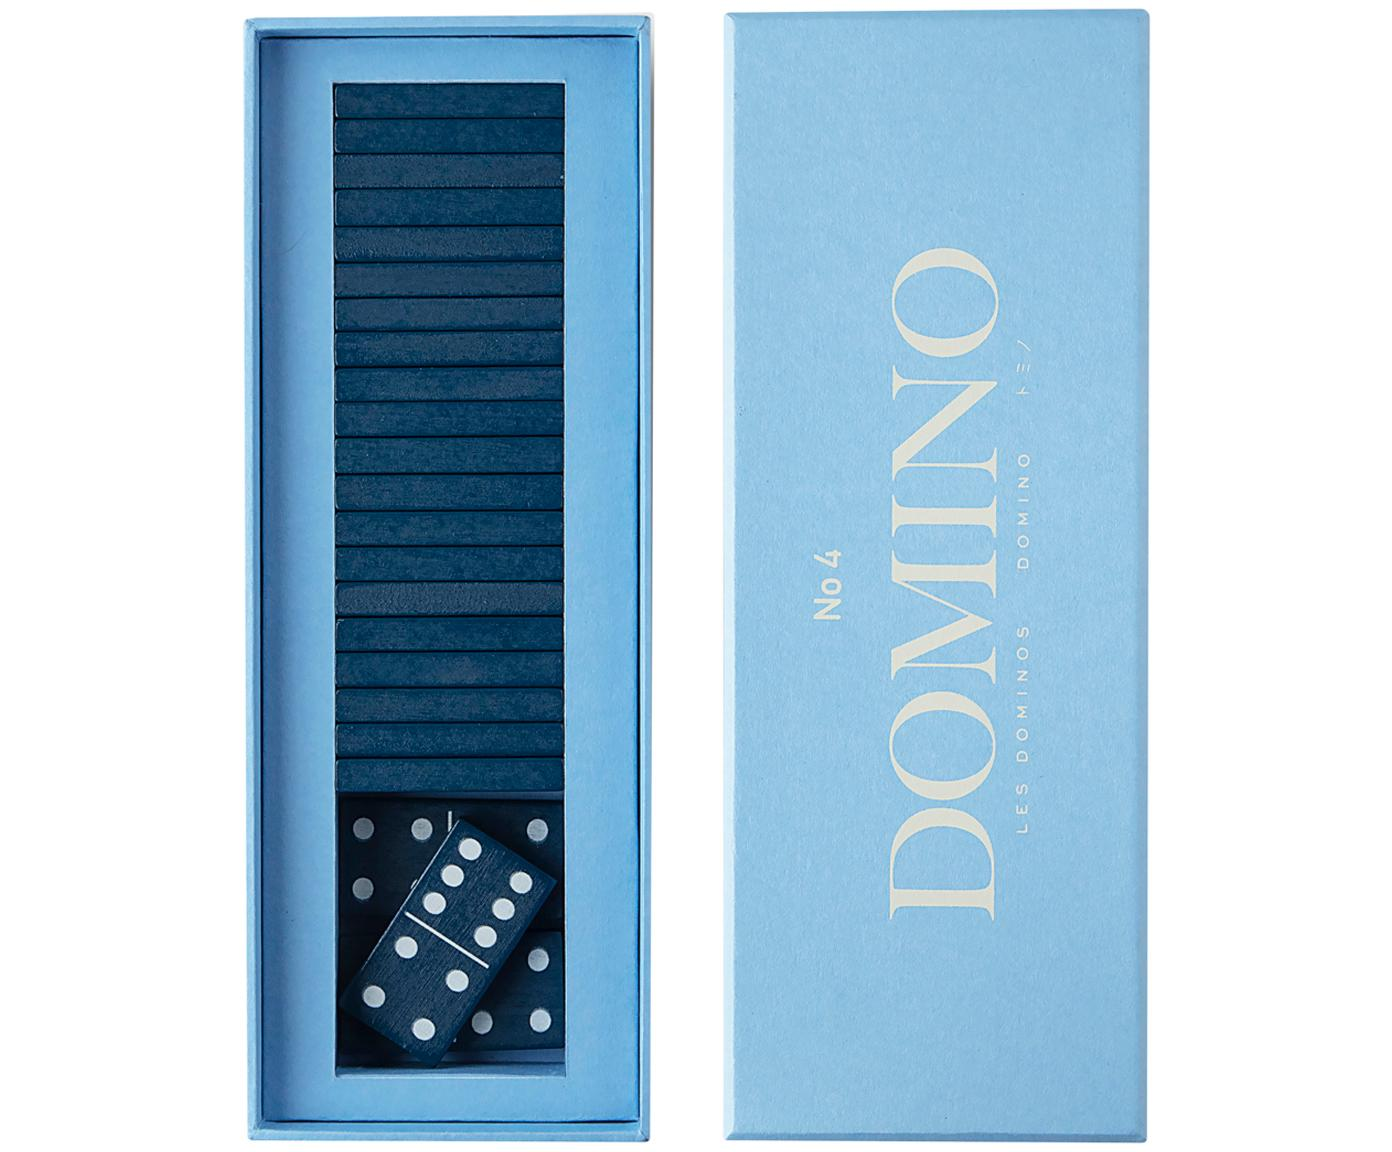 Domino-Set Classic, 30-tlg., Papier, Holz, Blau, 24 x 5 cm